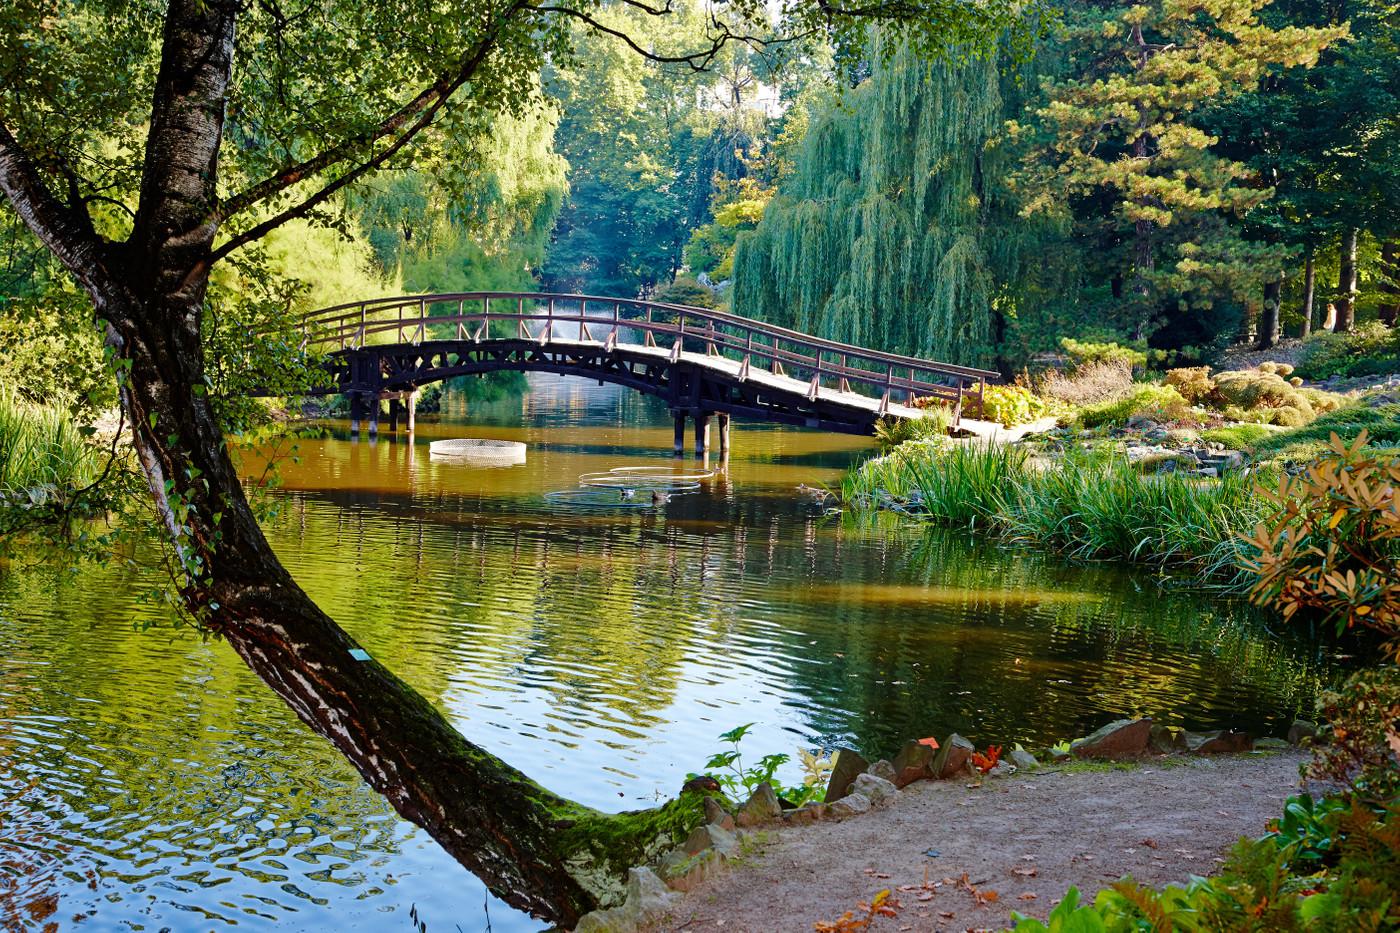 Japanese Garden, Wrocław